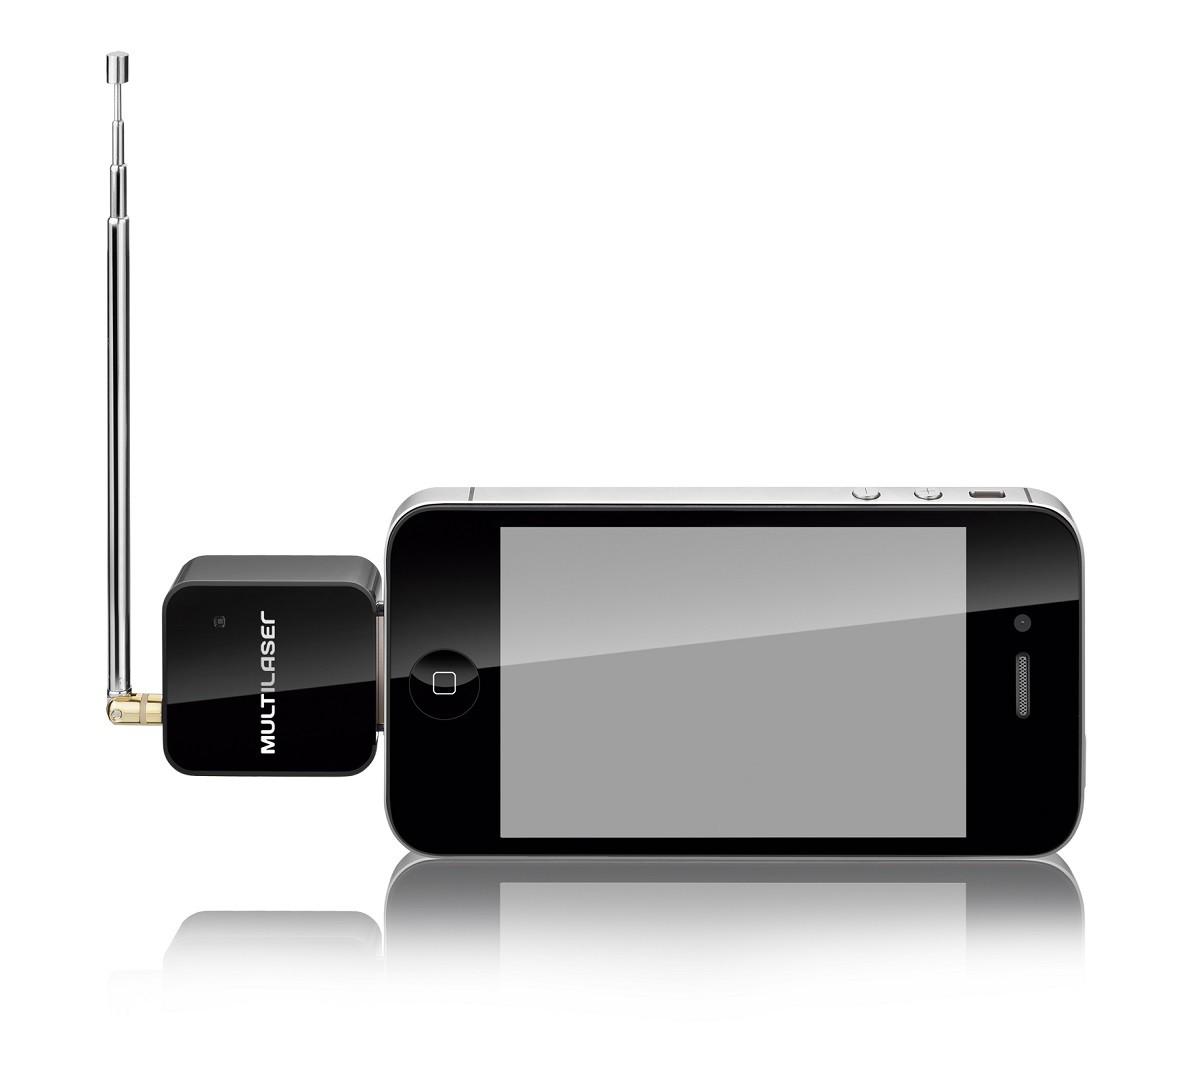 Receptor De Tv Digital P/ Iphone Ipod ipad Multilaser Tv006  - Mix Eletro